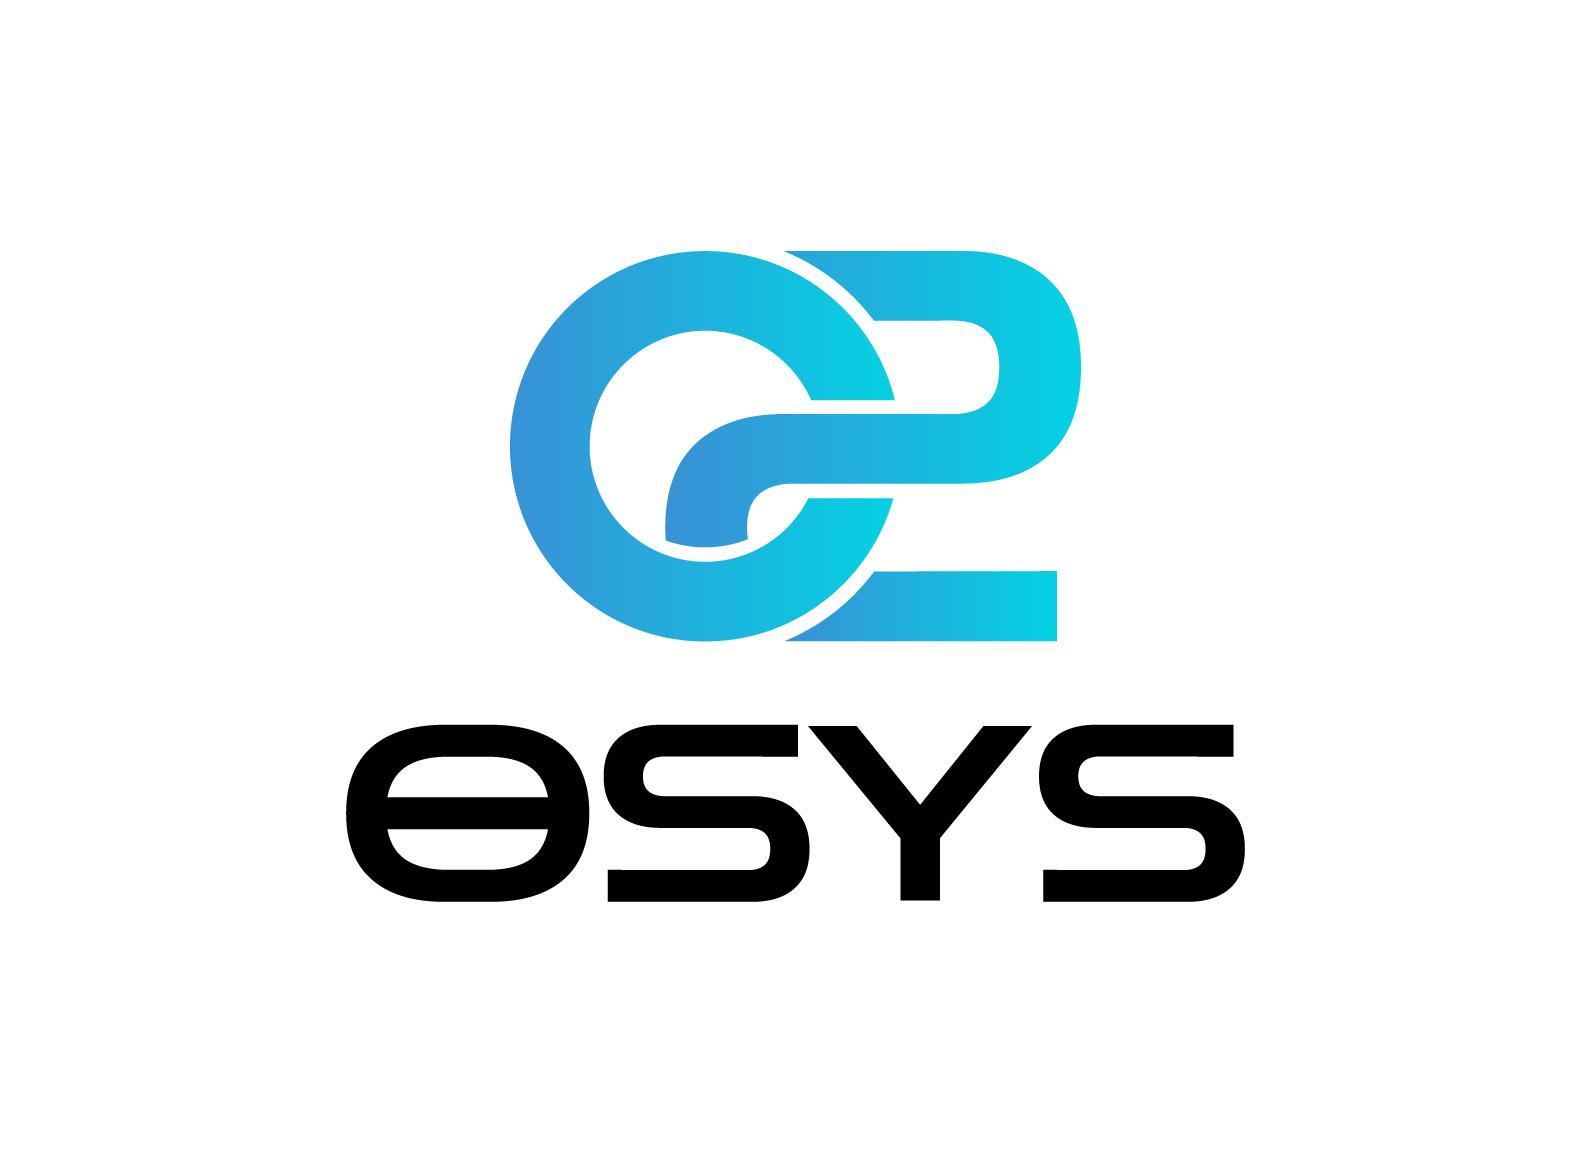 Osys logo